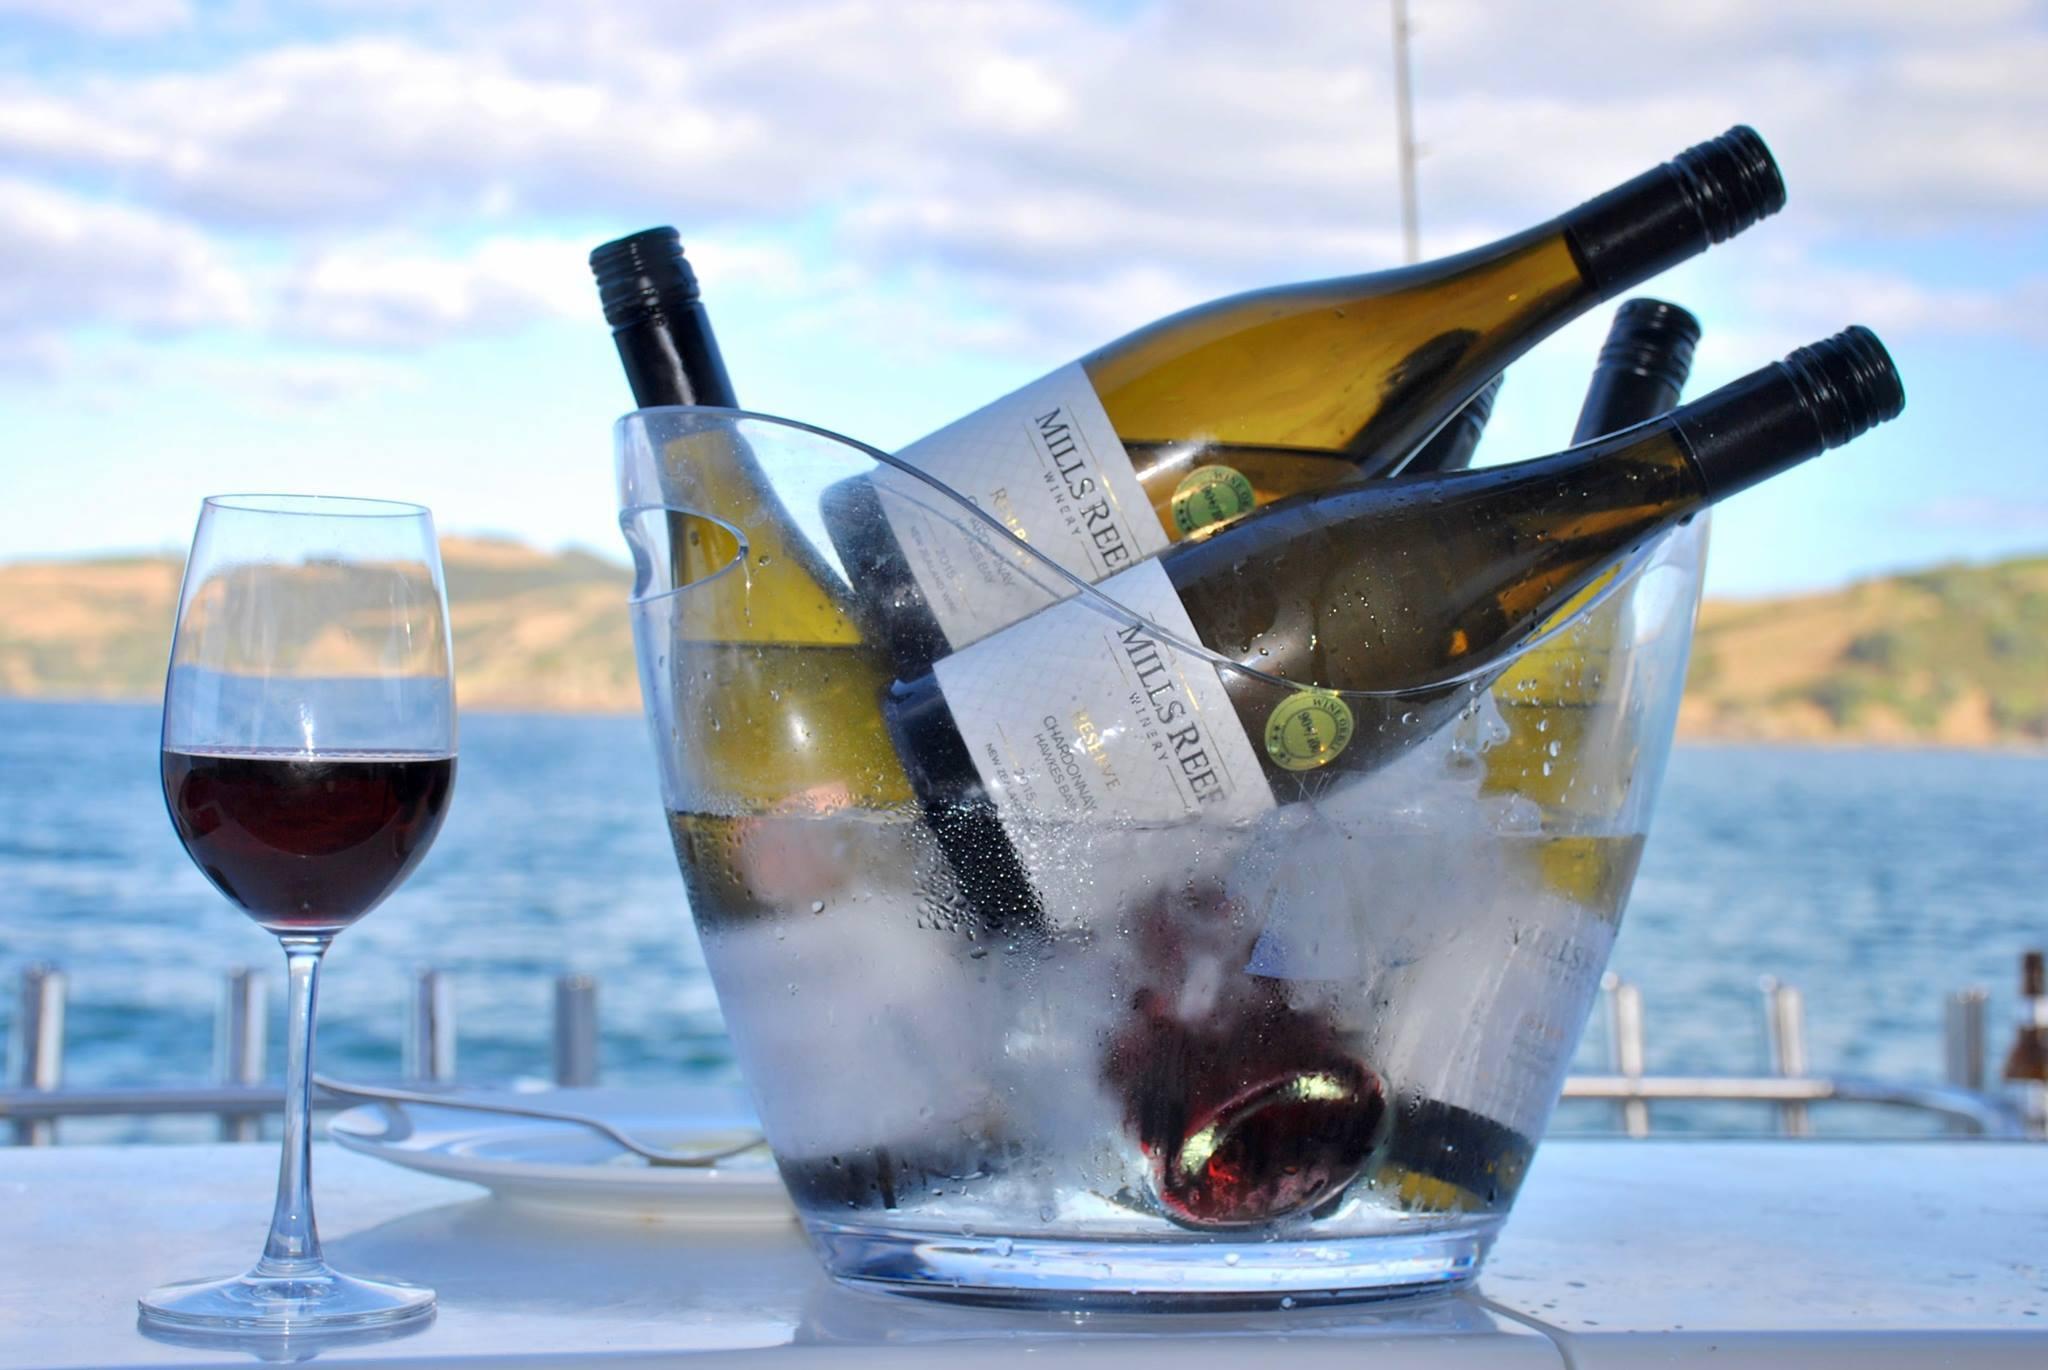 Mills Reef Winery & Restaurant